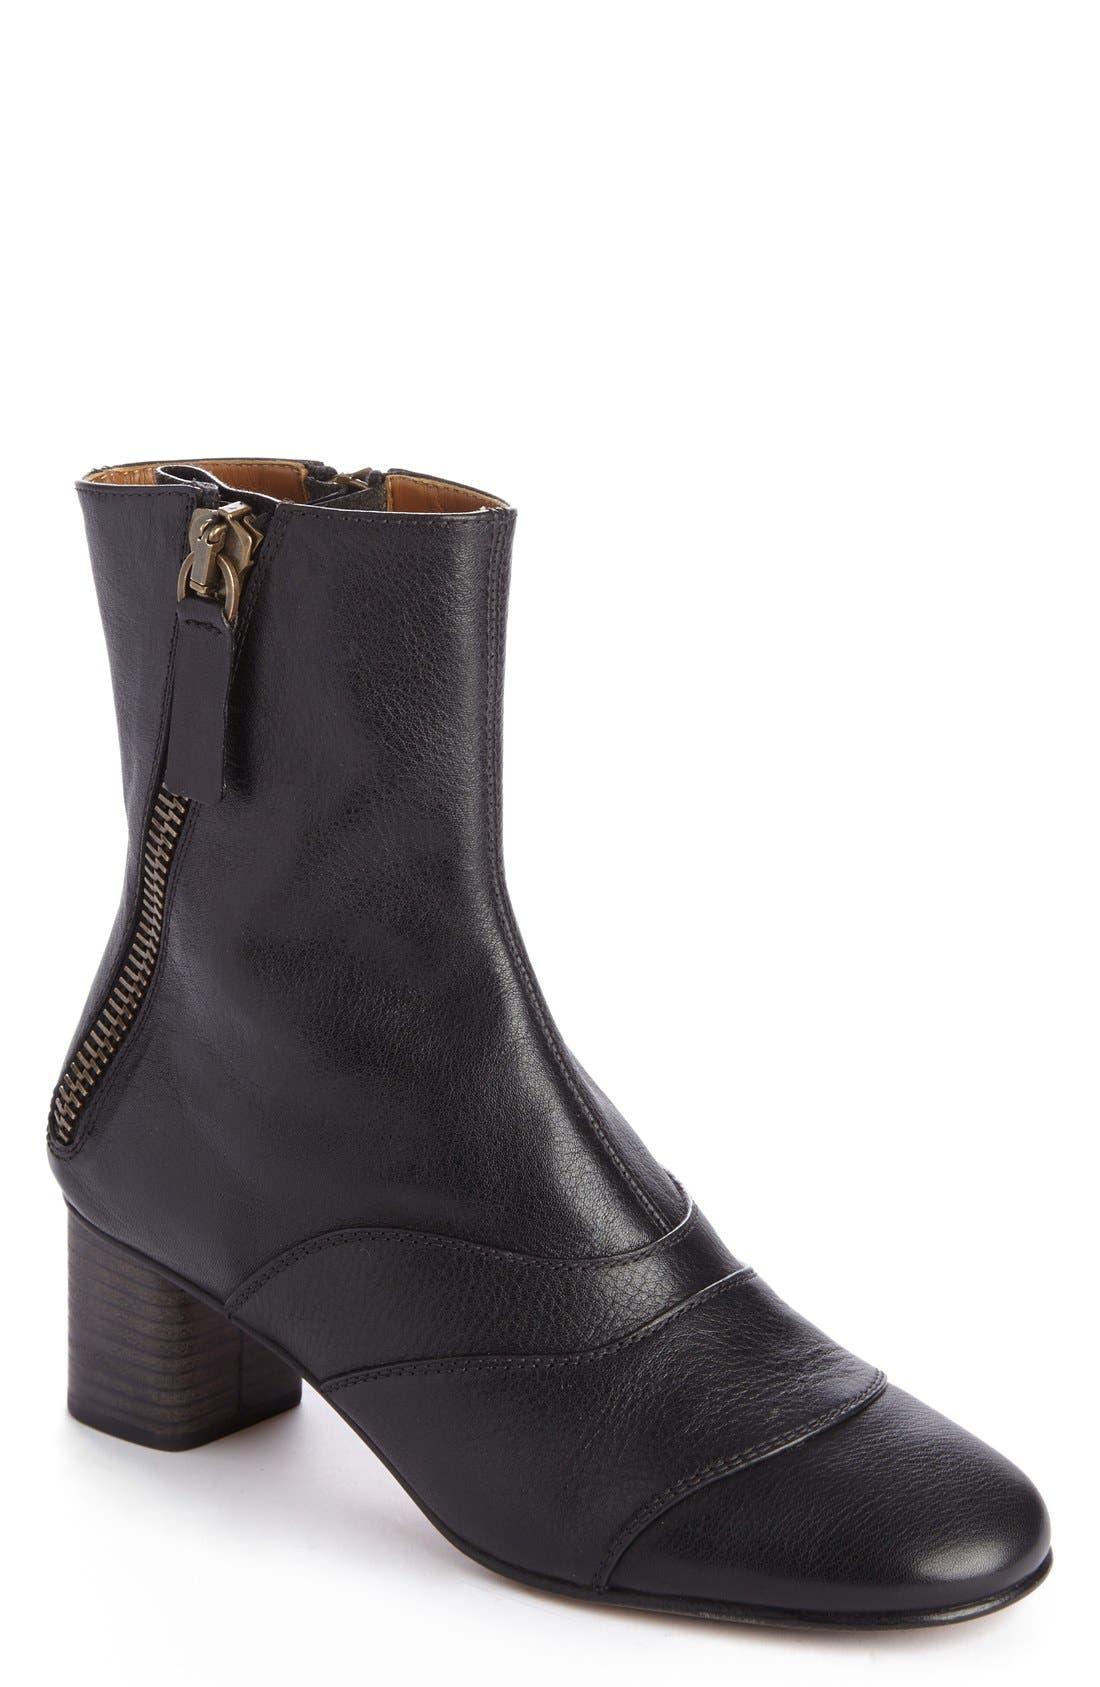 'Lexie' Block Heel Boot,                             Main thumbnail 1, color,                             001